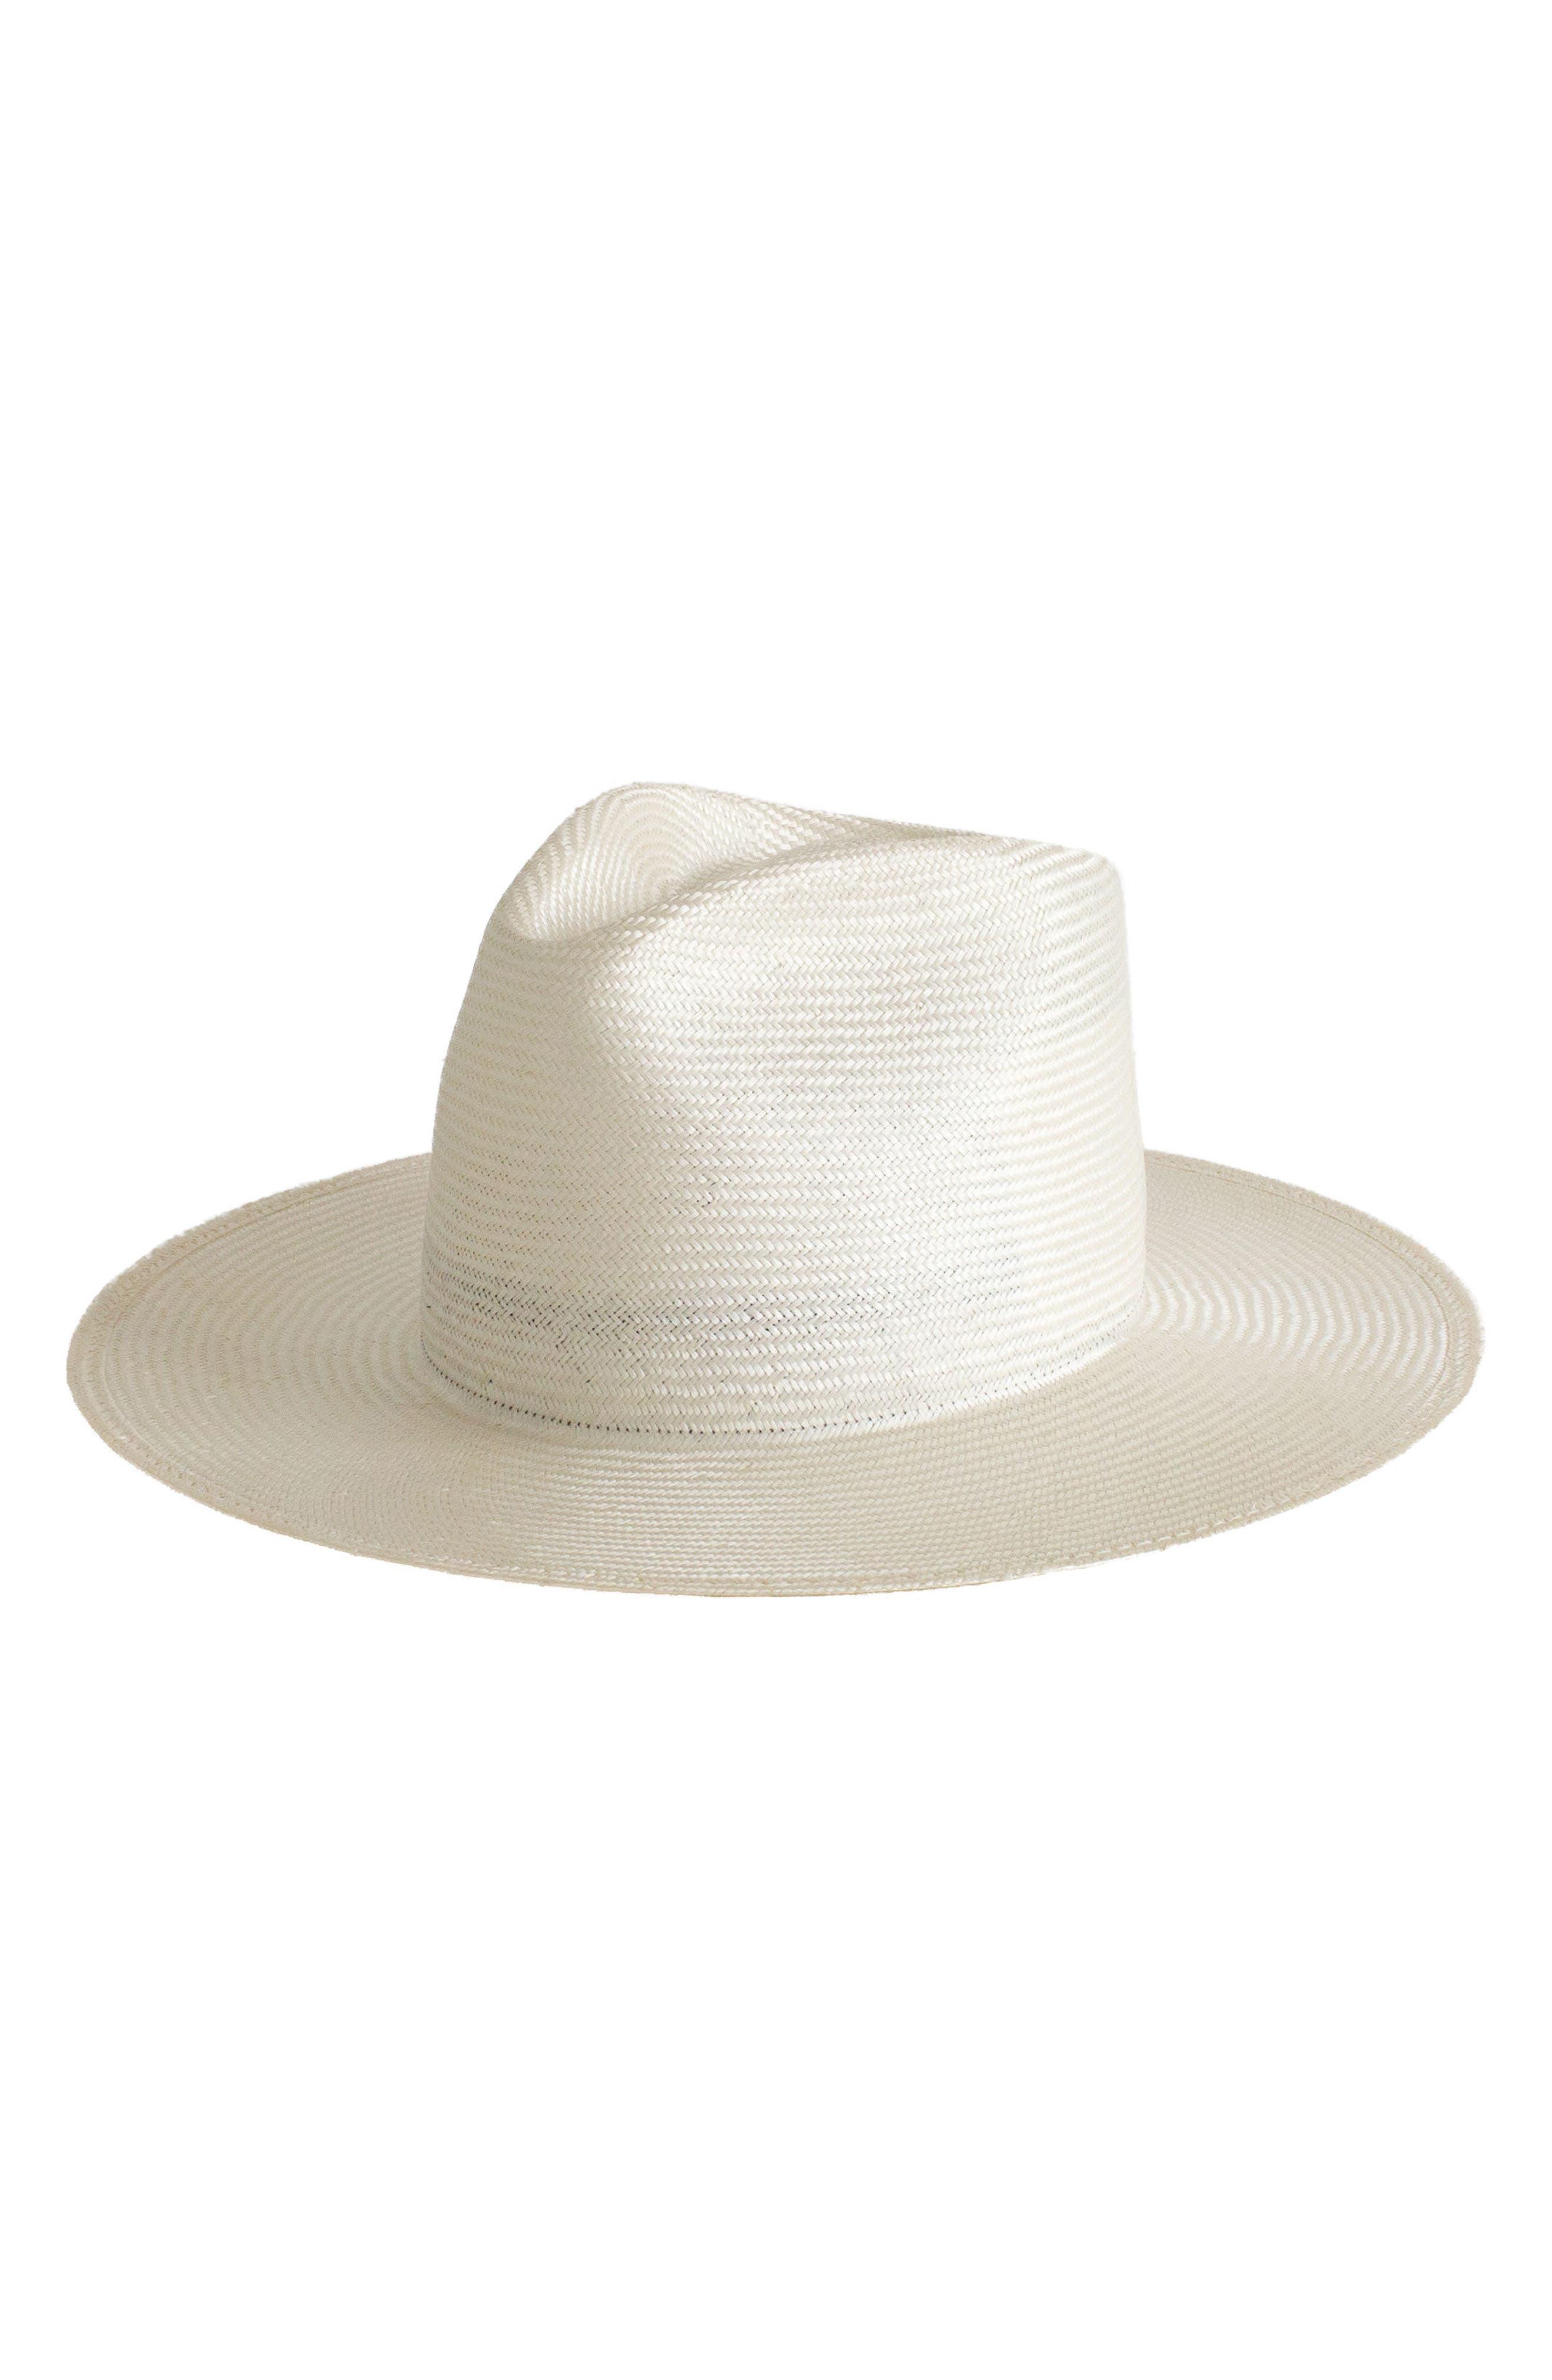 Alexander Straw Hat,                             Main thumbnail 1, color,                             900